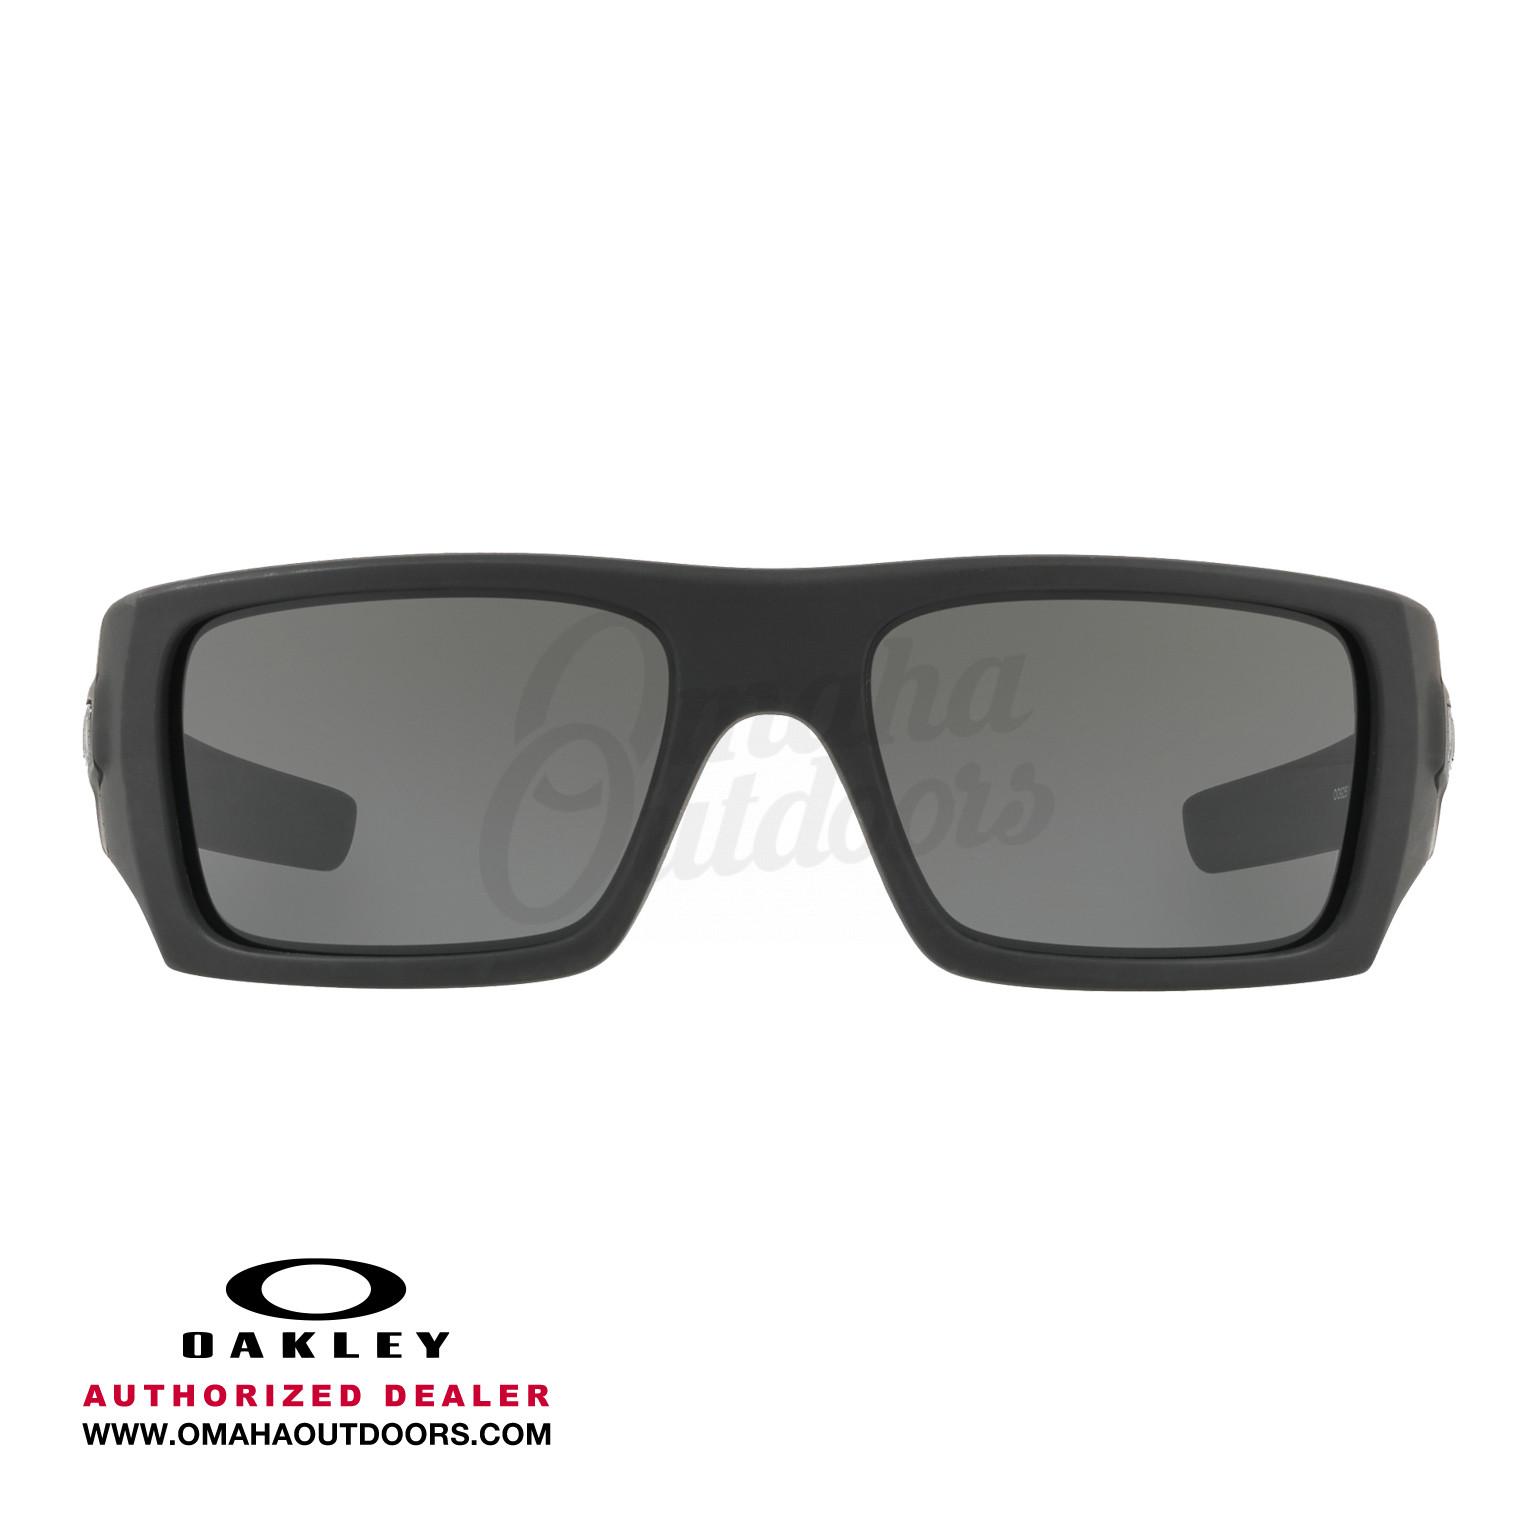 Oakley Det Cord >> Oakley Si Ballistic Det Cord Cerakote Safety Eyeglasses Gray Lens